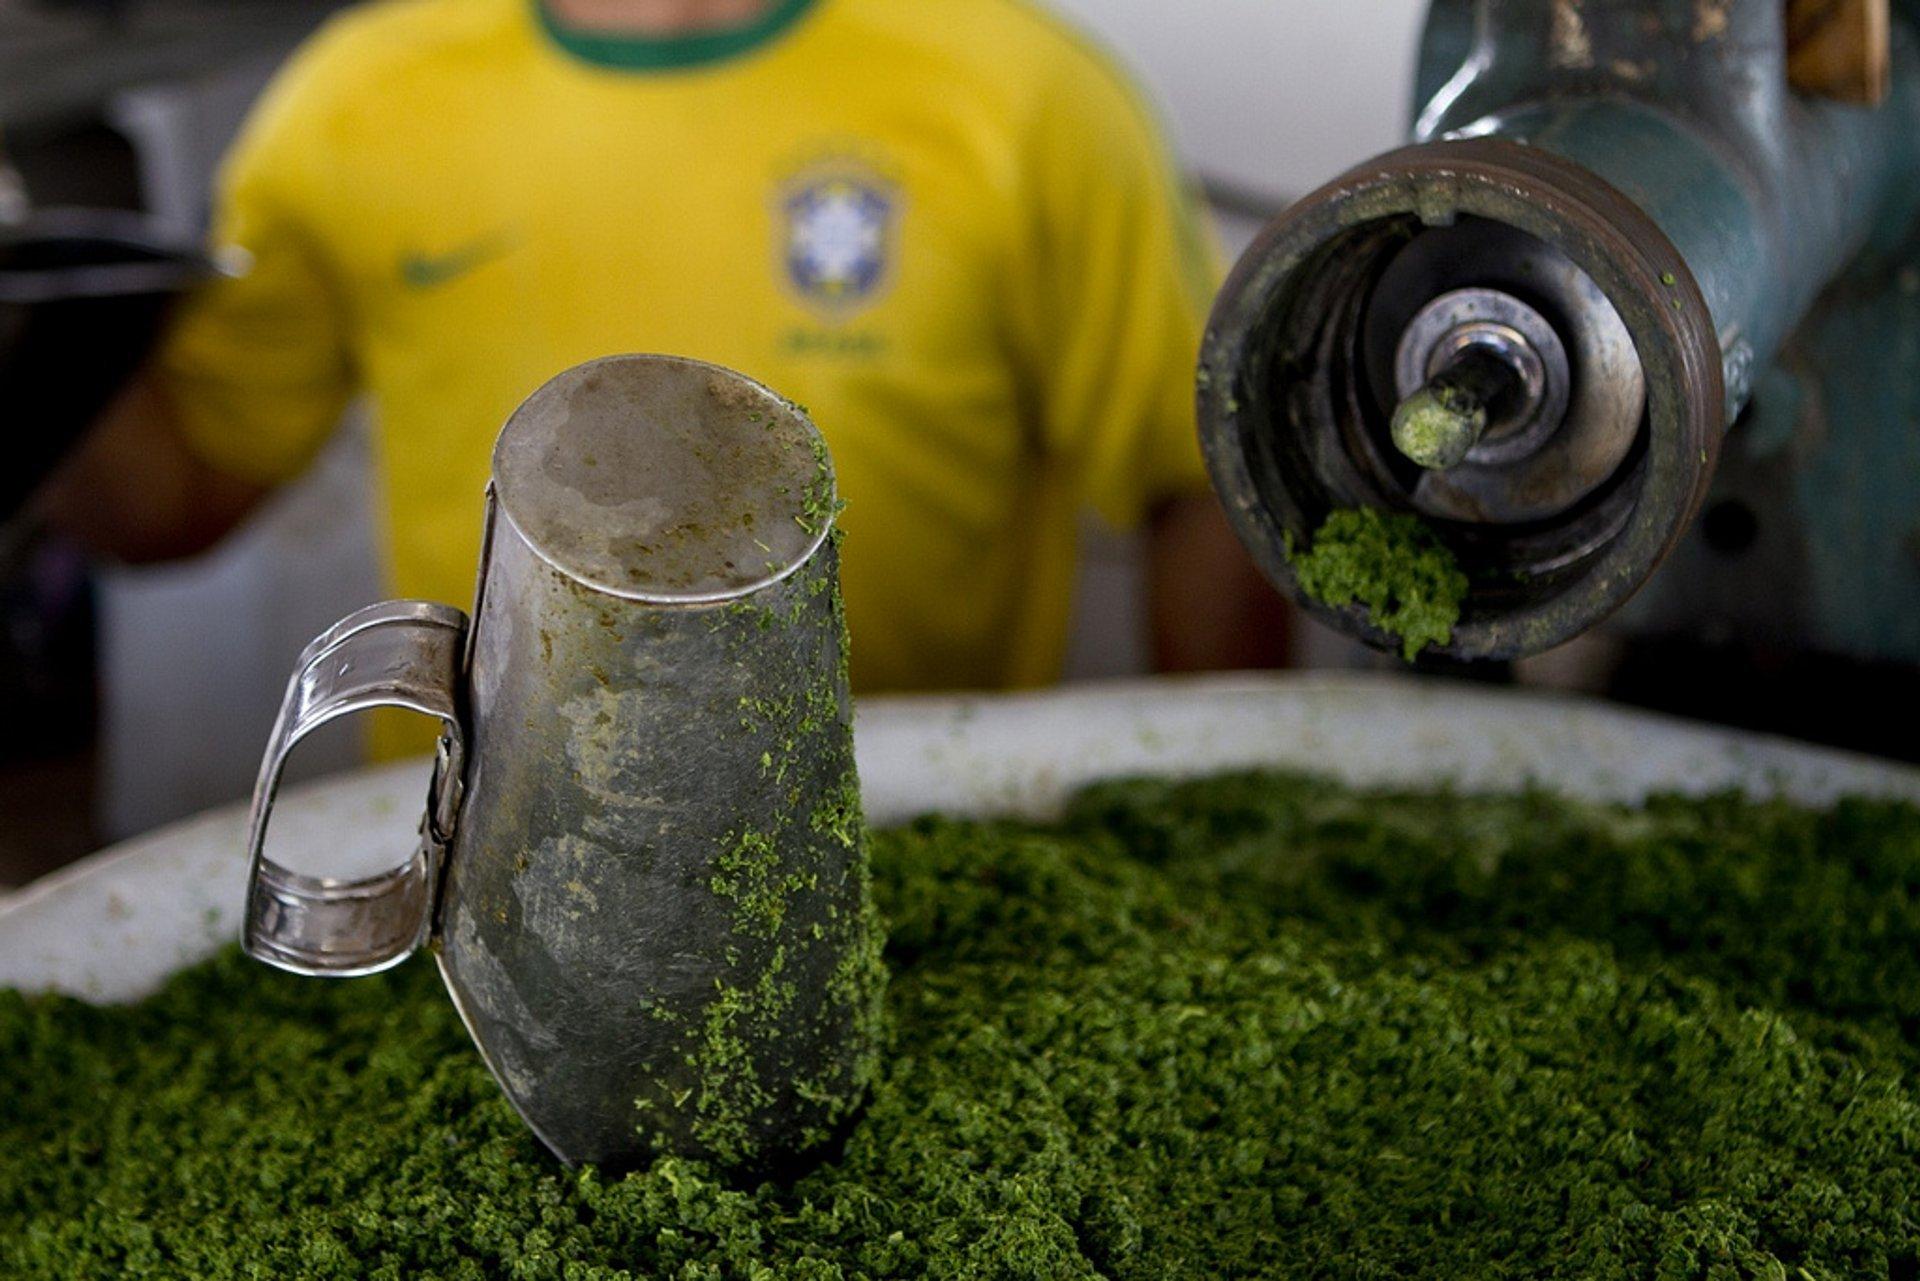 Maniçoba in Brazil - Best Time